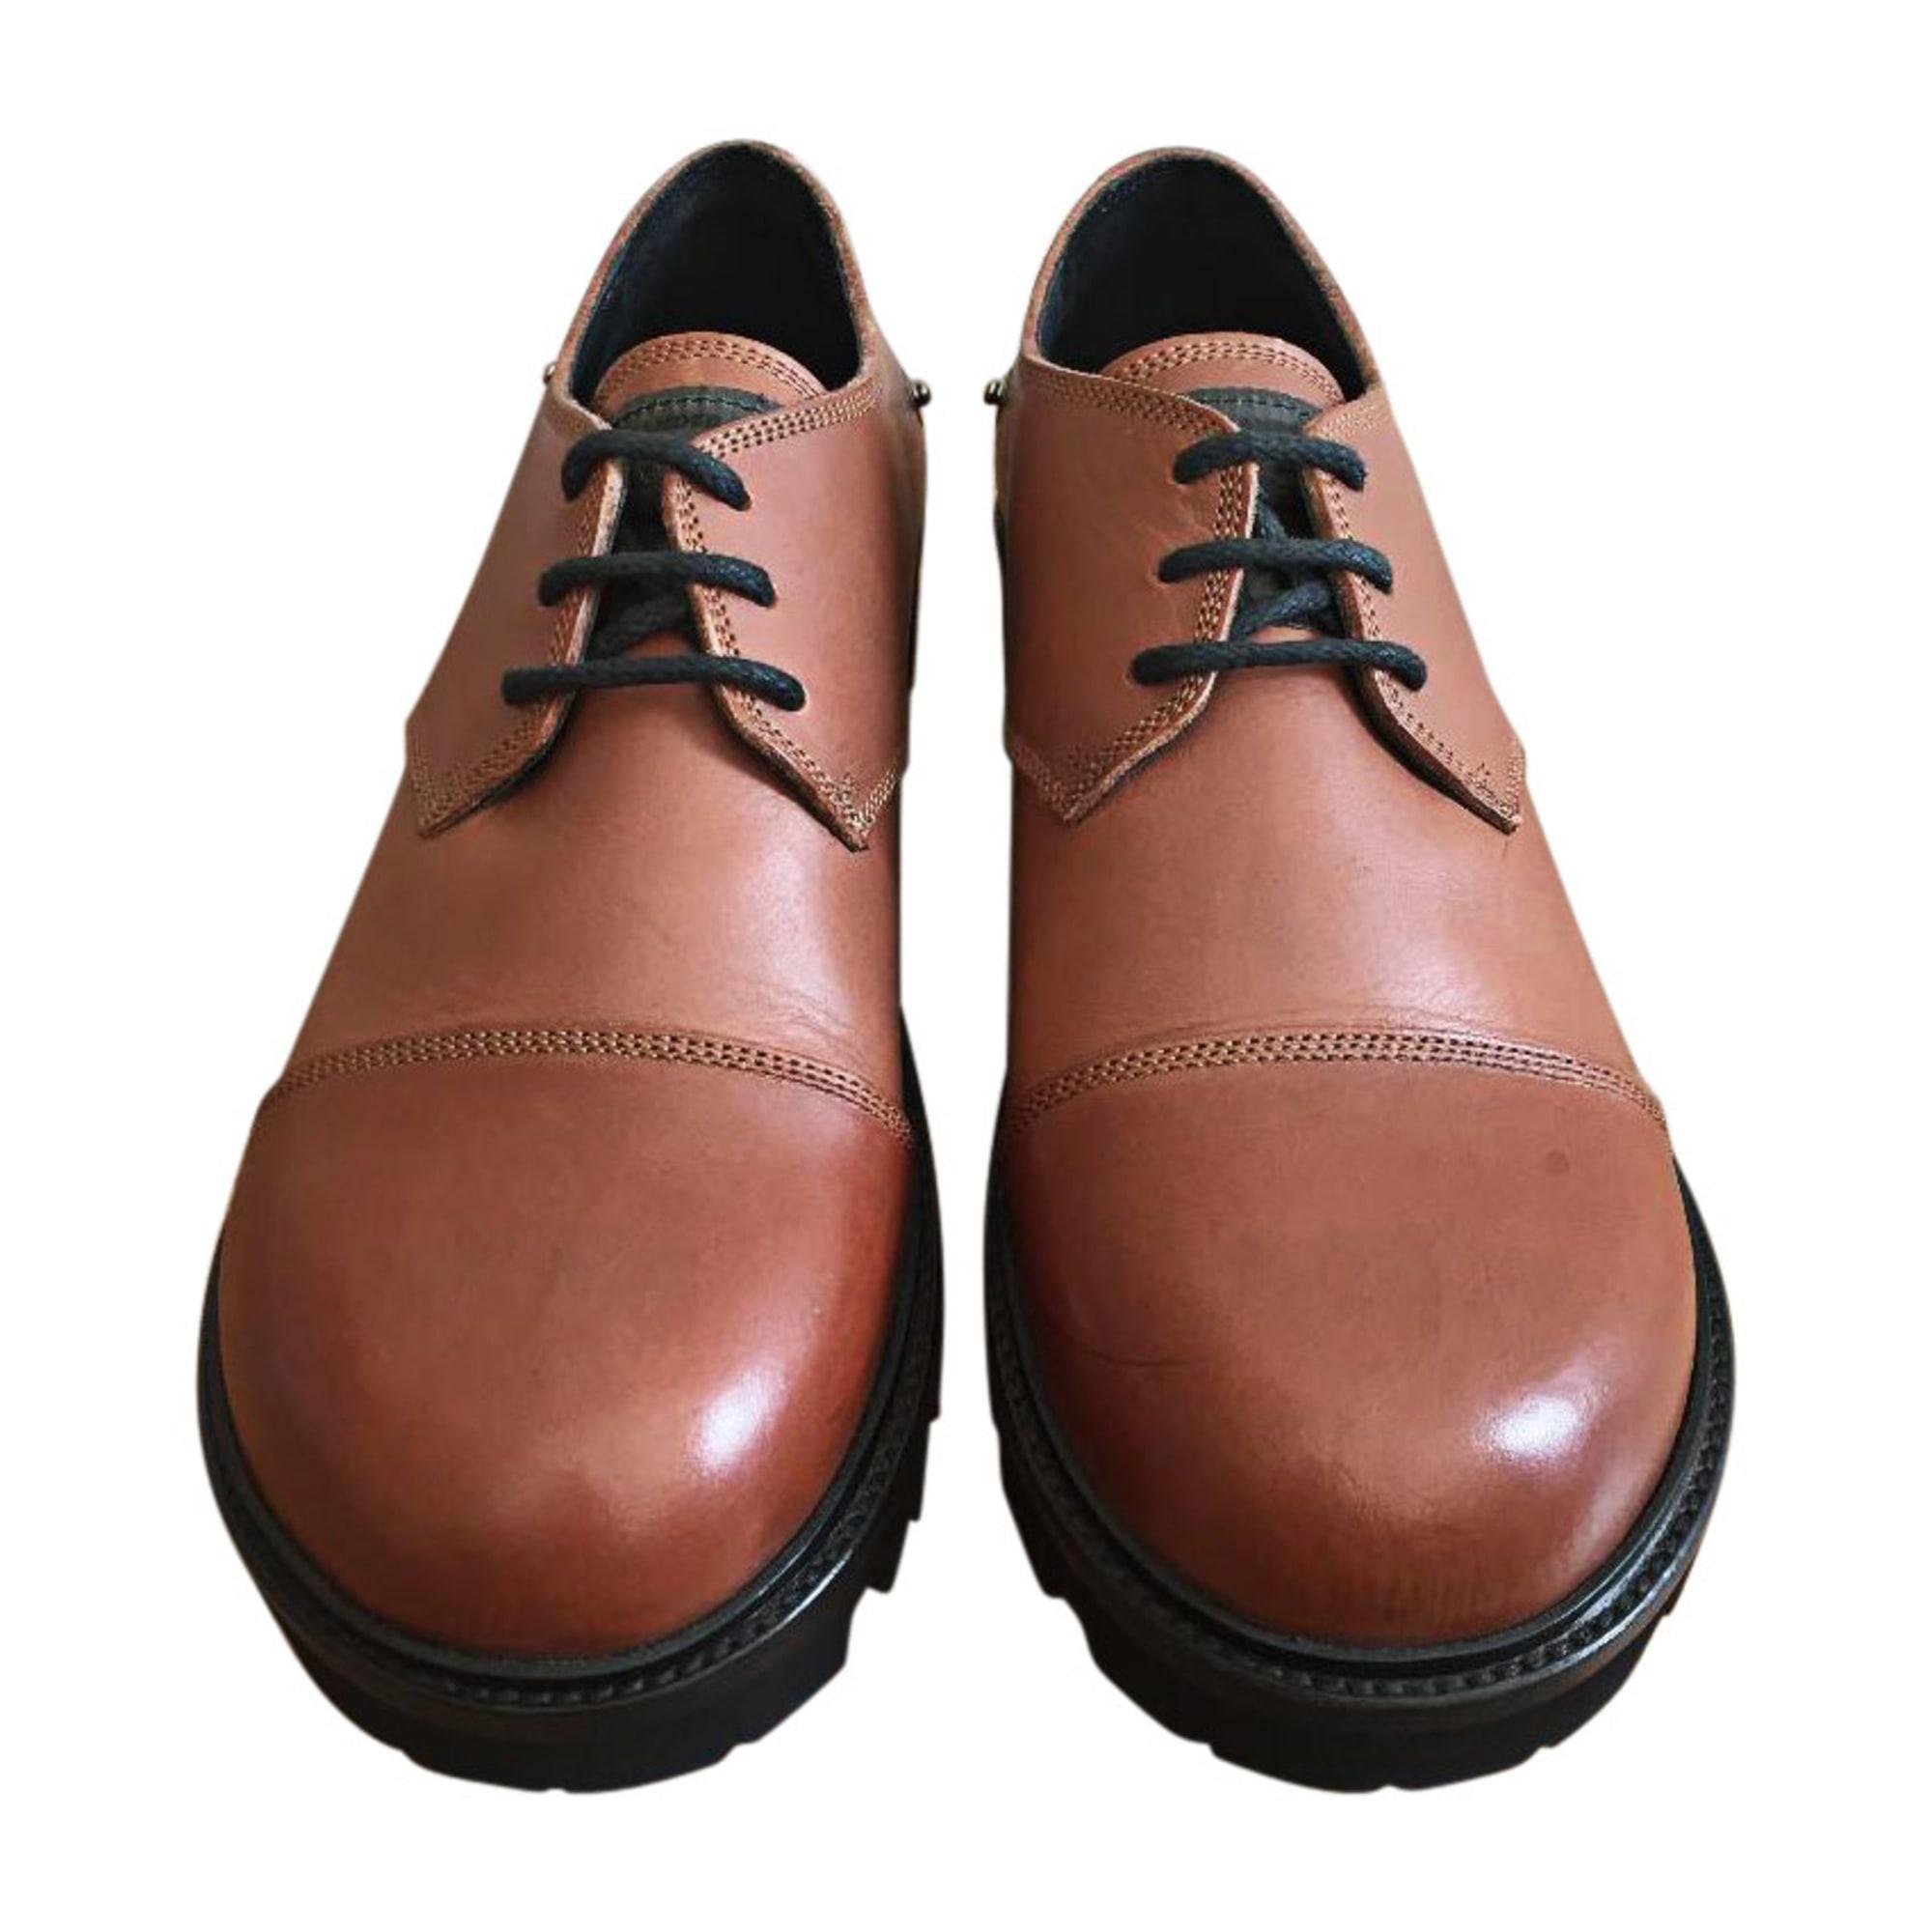 Lace Up Shoes JIL SANDER Beige, camel